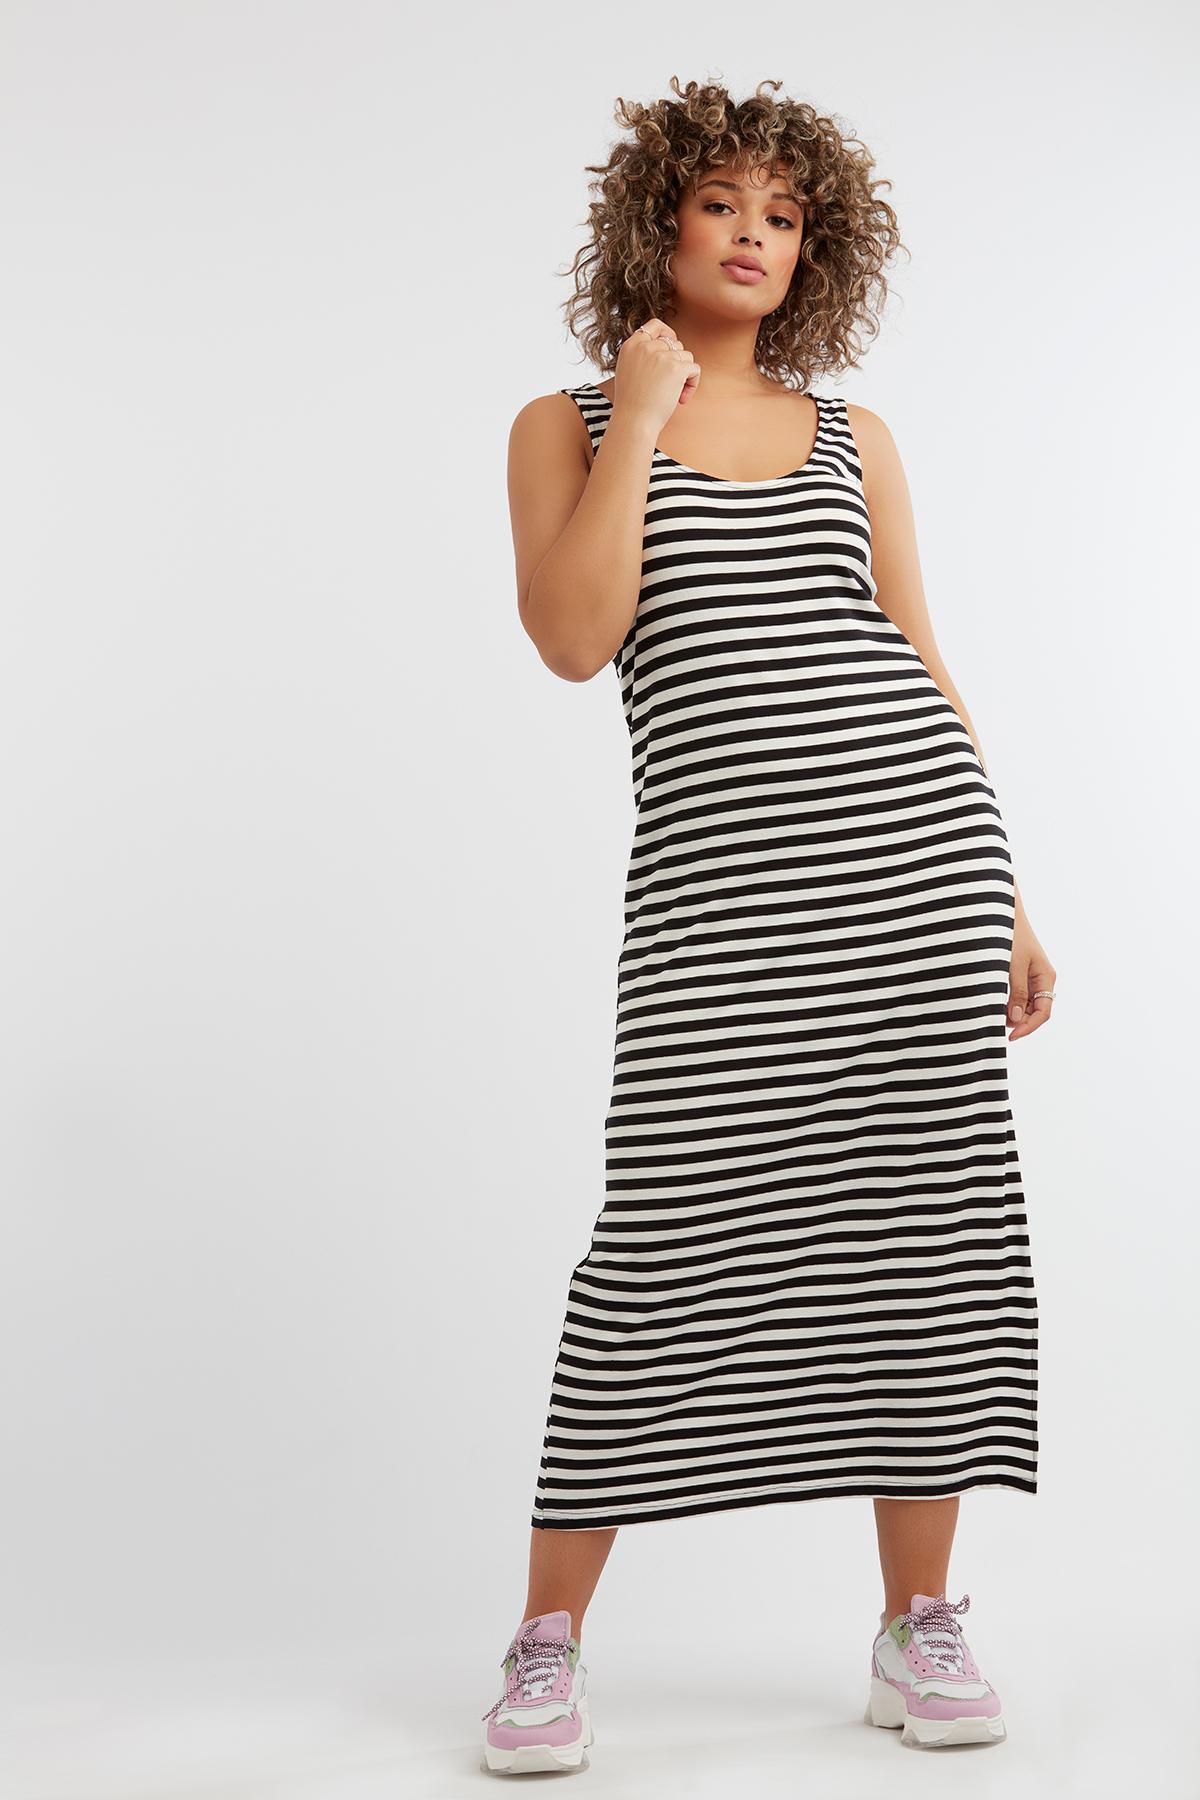 814d435e31f Damas Vestido de rayas sin mangas Multi Gris-Negro